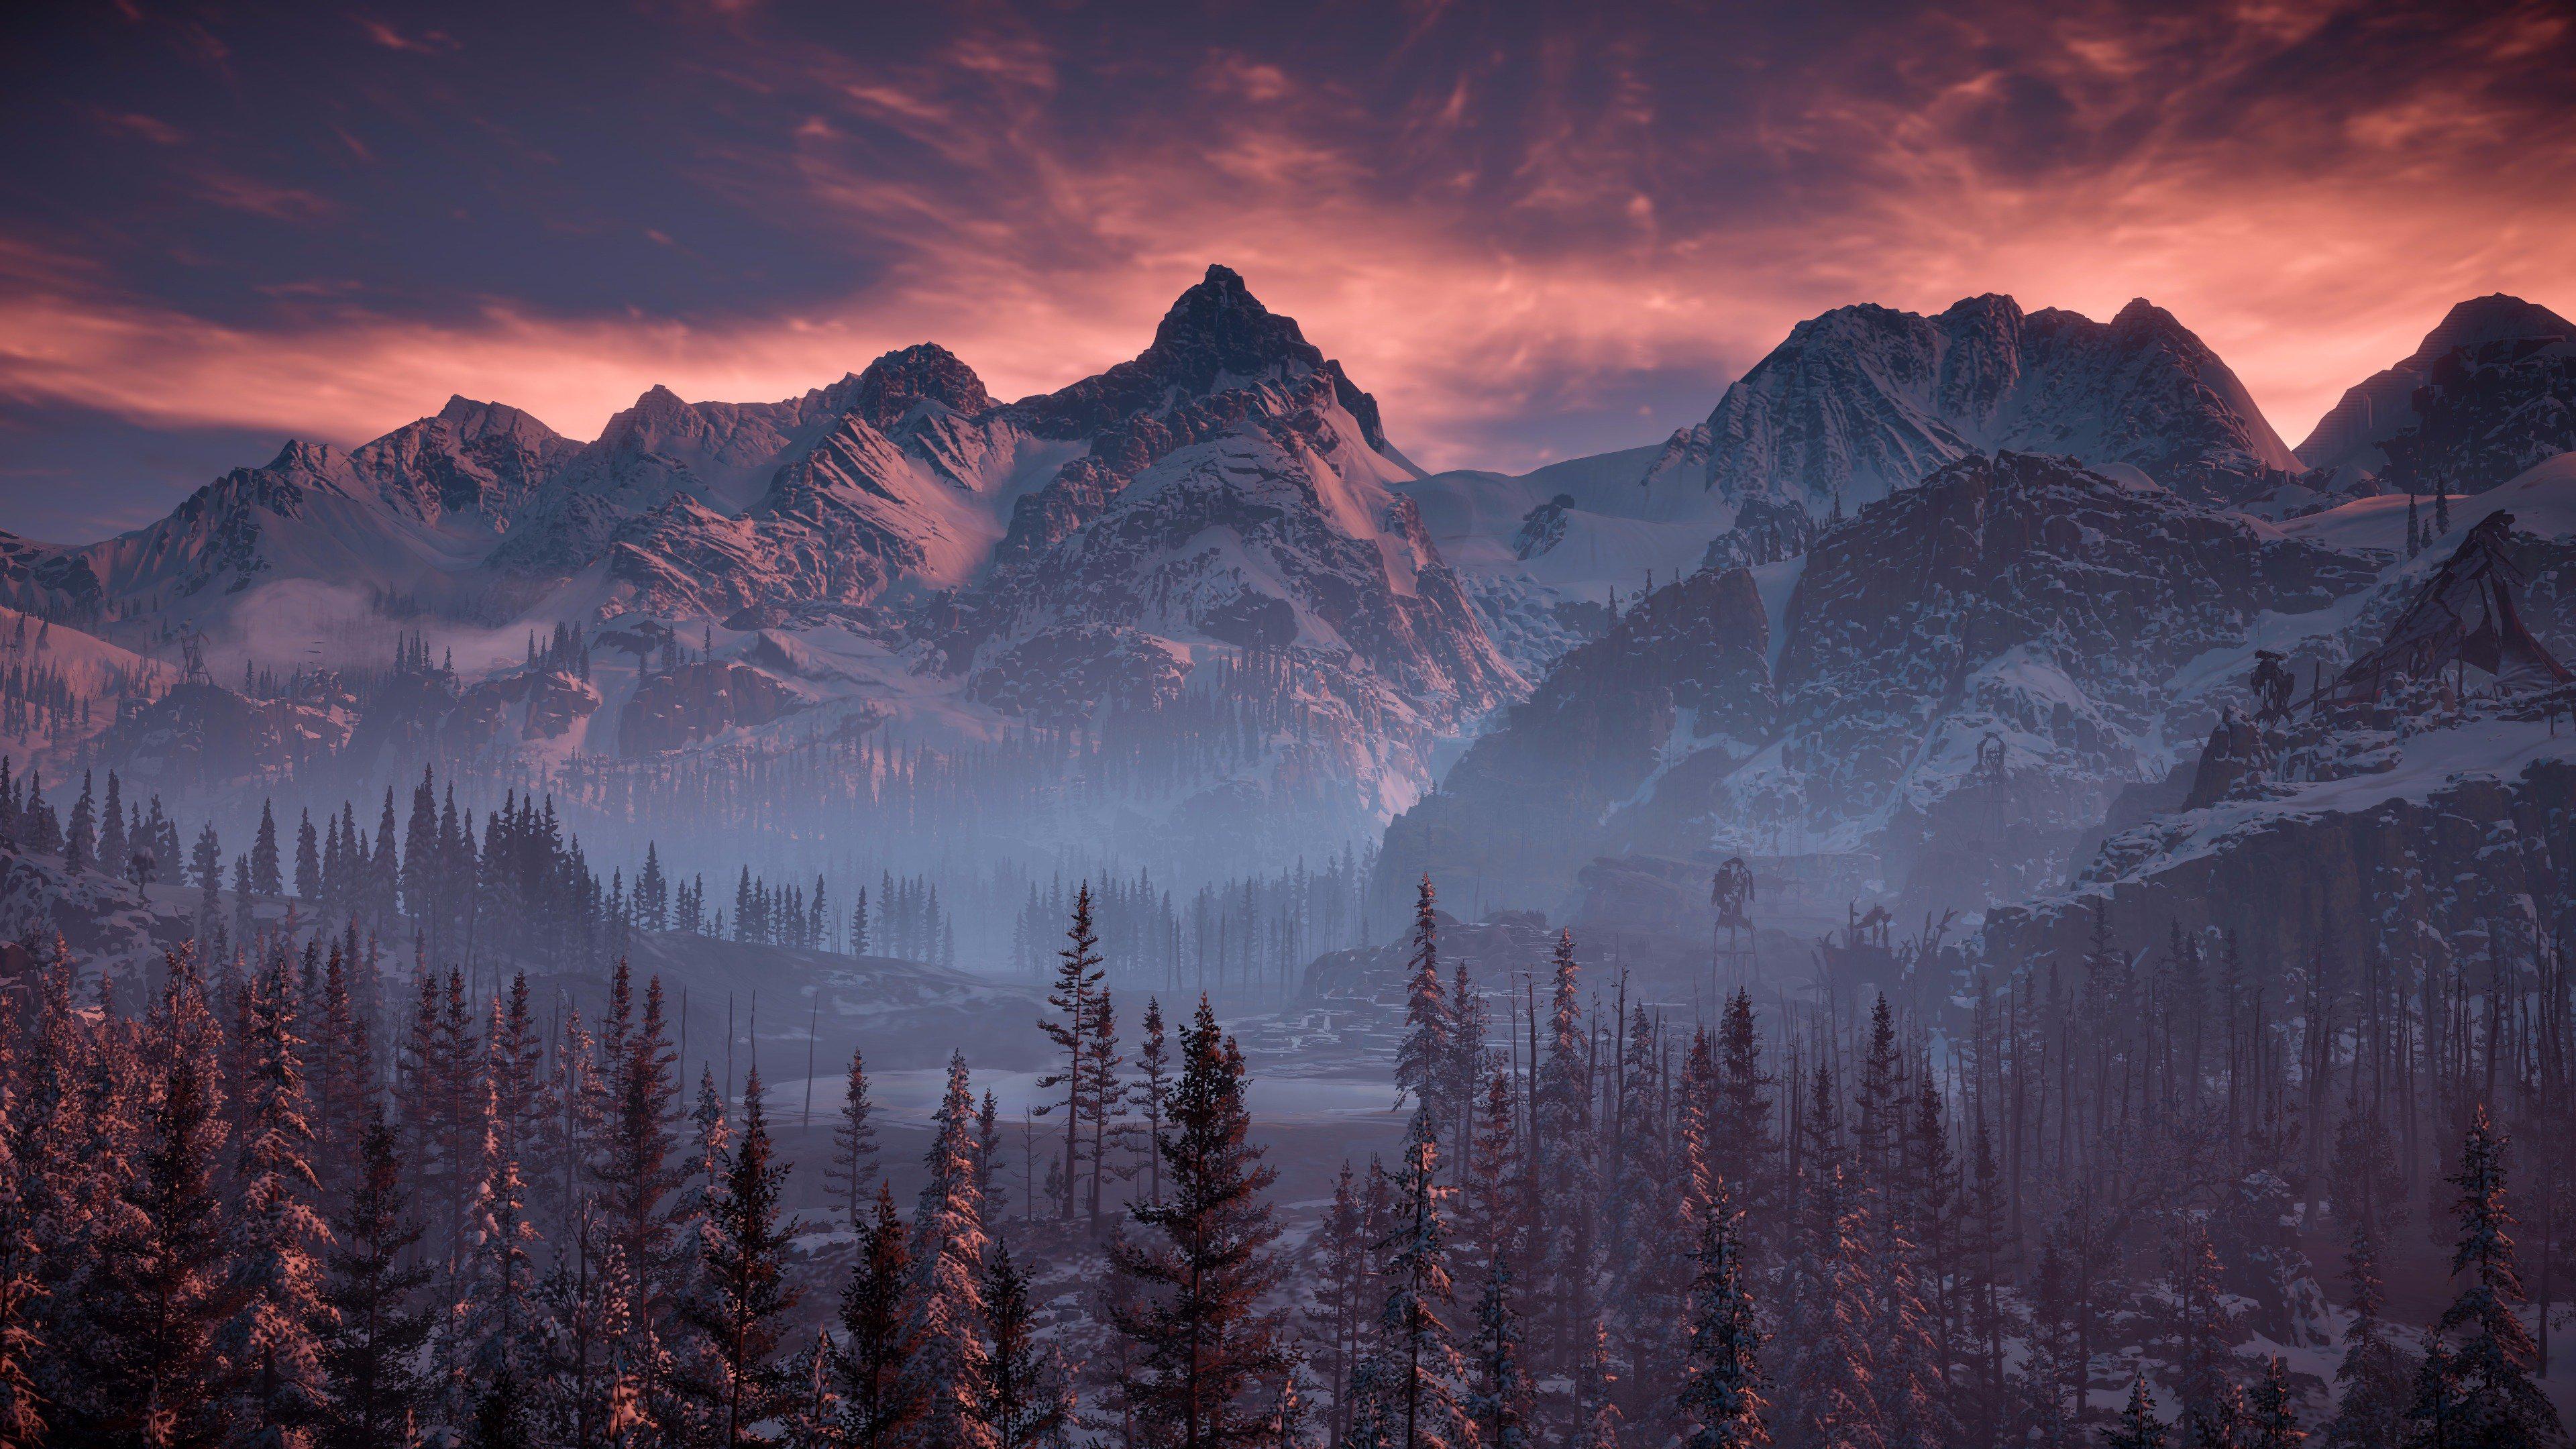 Most Inspiring Wallpaper Mountain Horizon - horizon-zero-dawn-nature-mountains-trees-sky-4k-yj  2018_481239.jpg